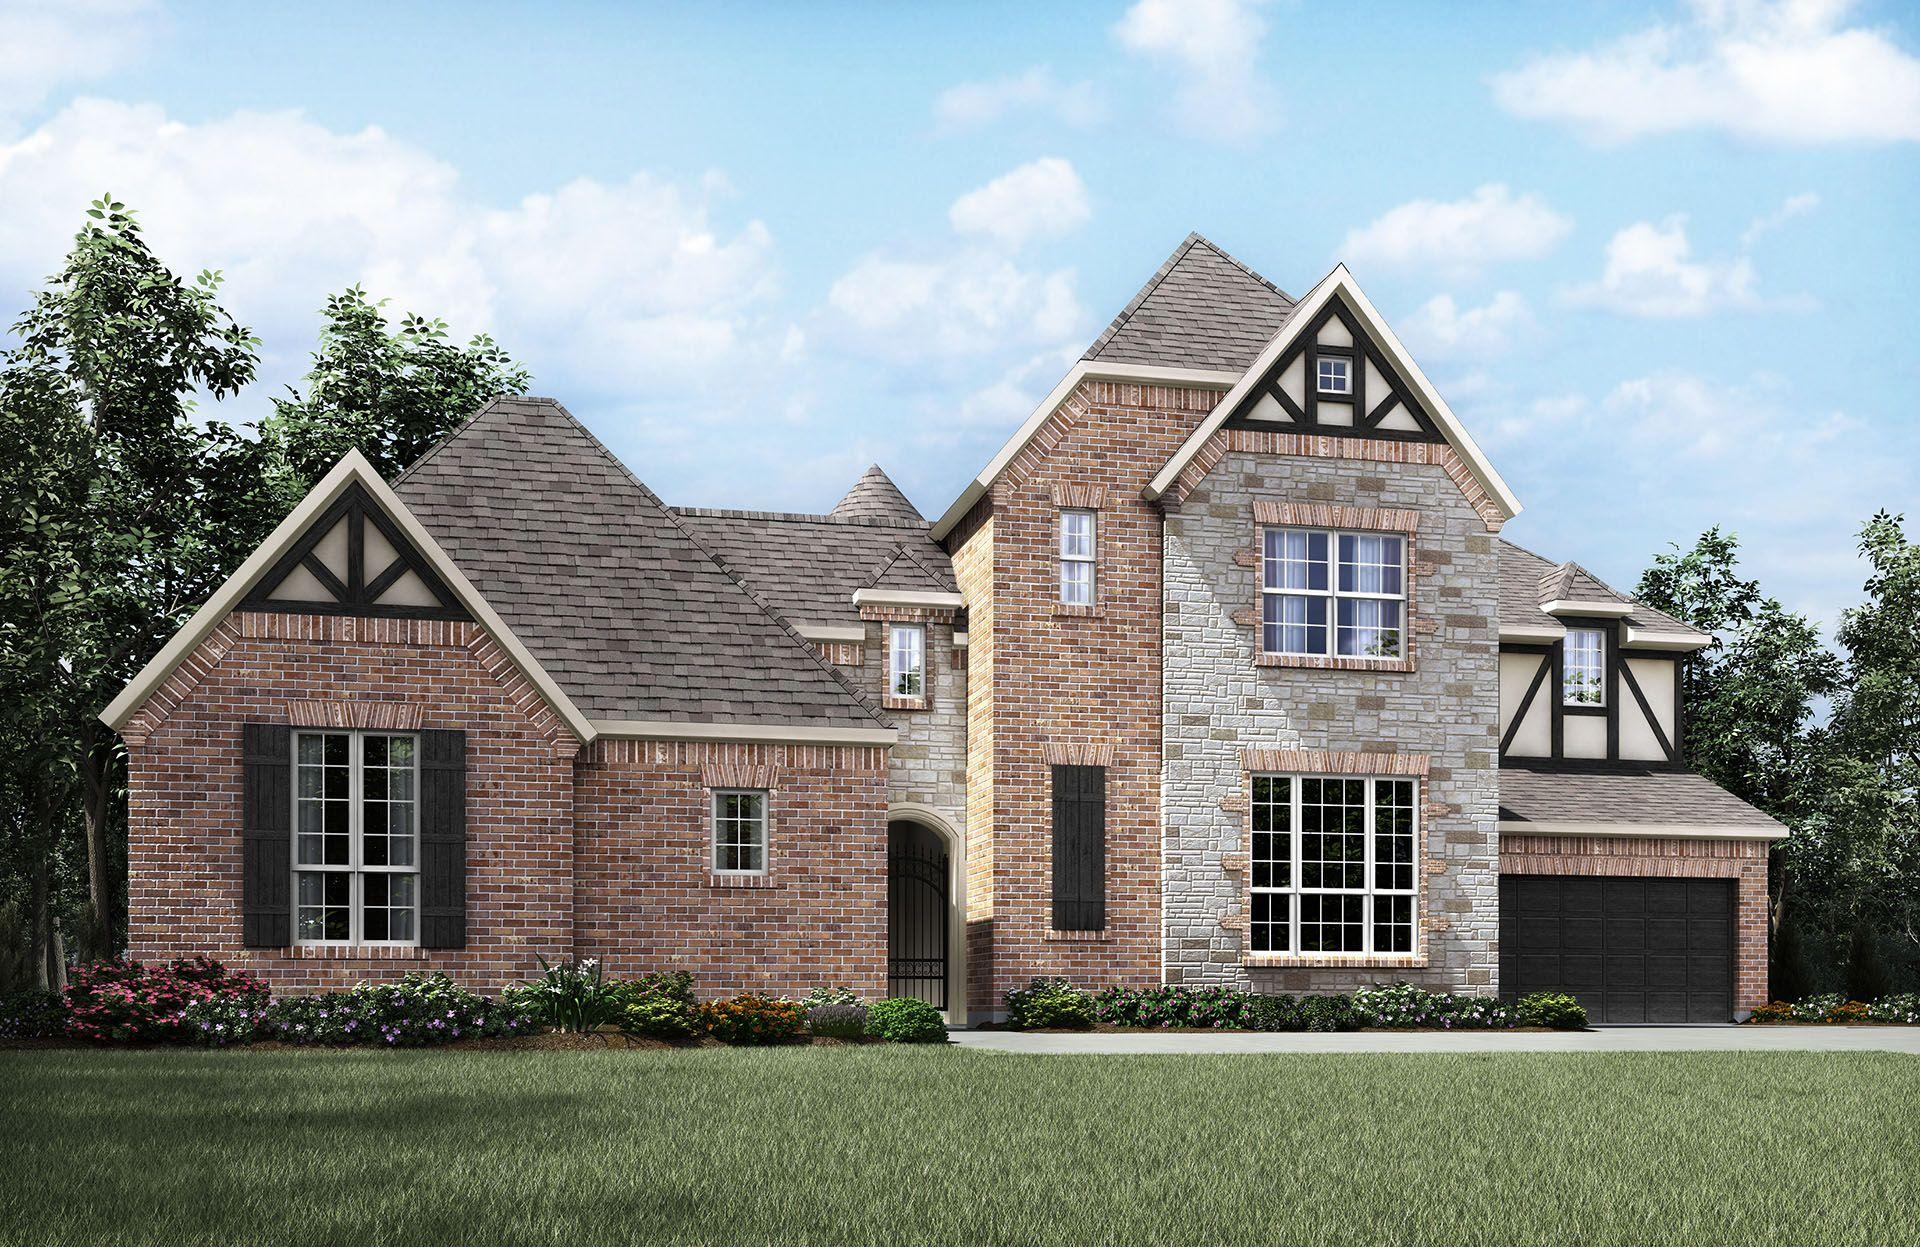 Single Family for Sale at Woodtrace - Ensenada Ii 33823 Mill Creek Way Pinehurst, Texas 77362 United States